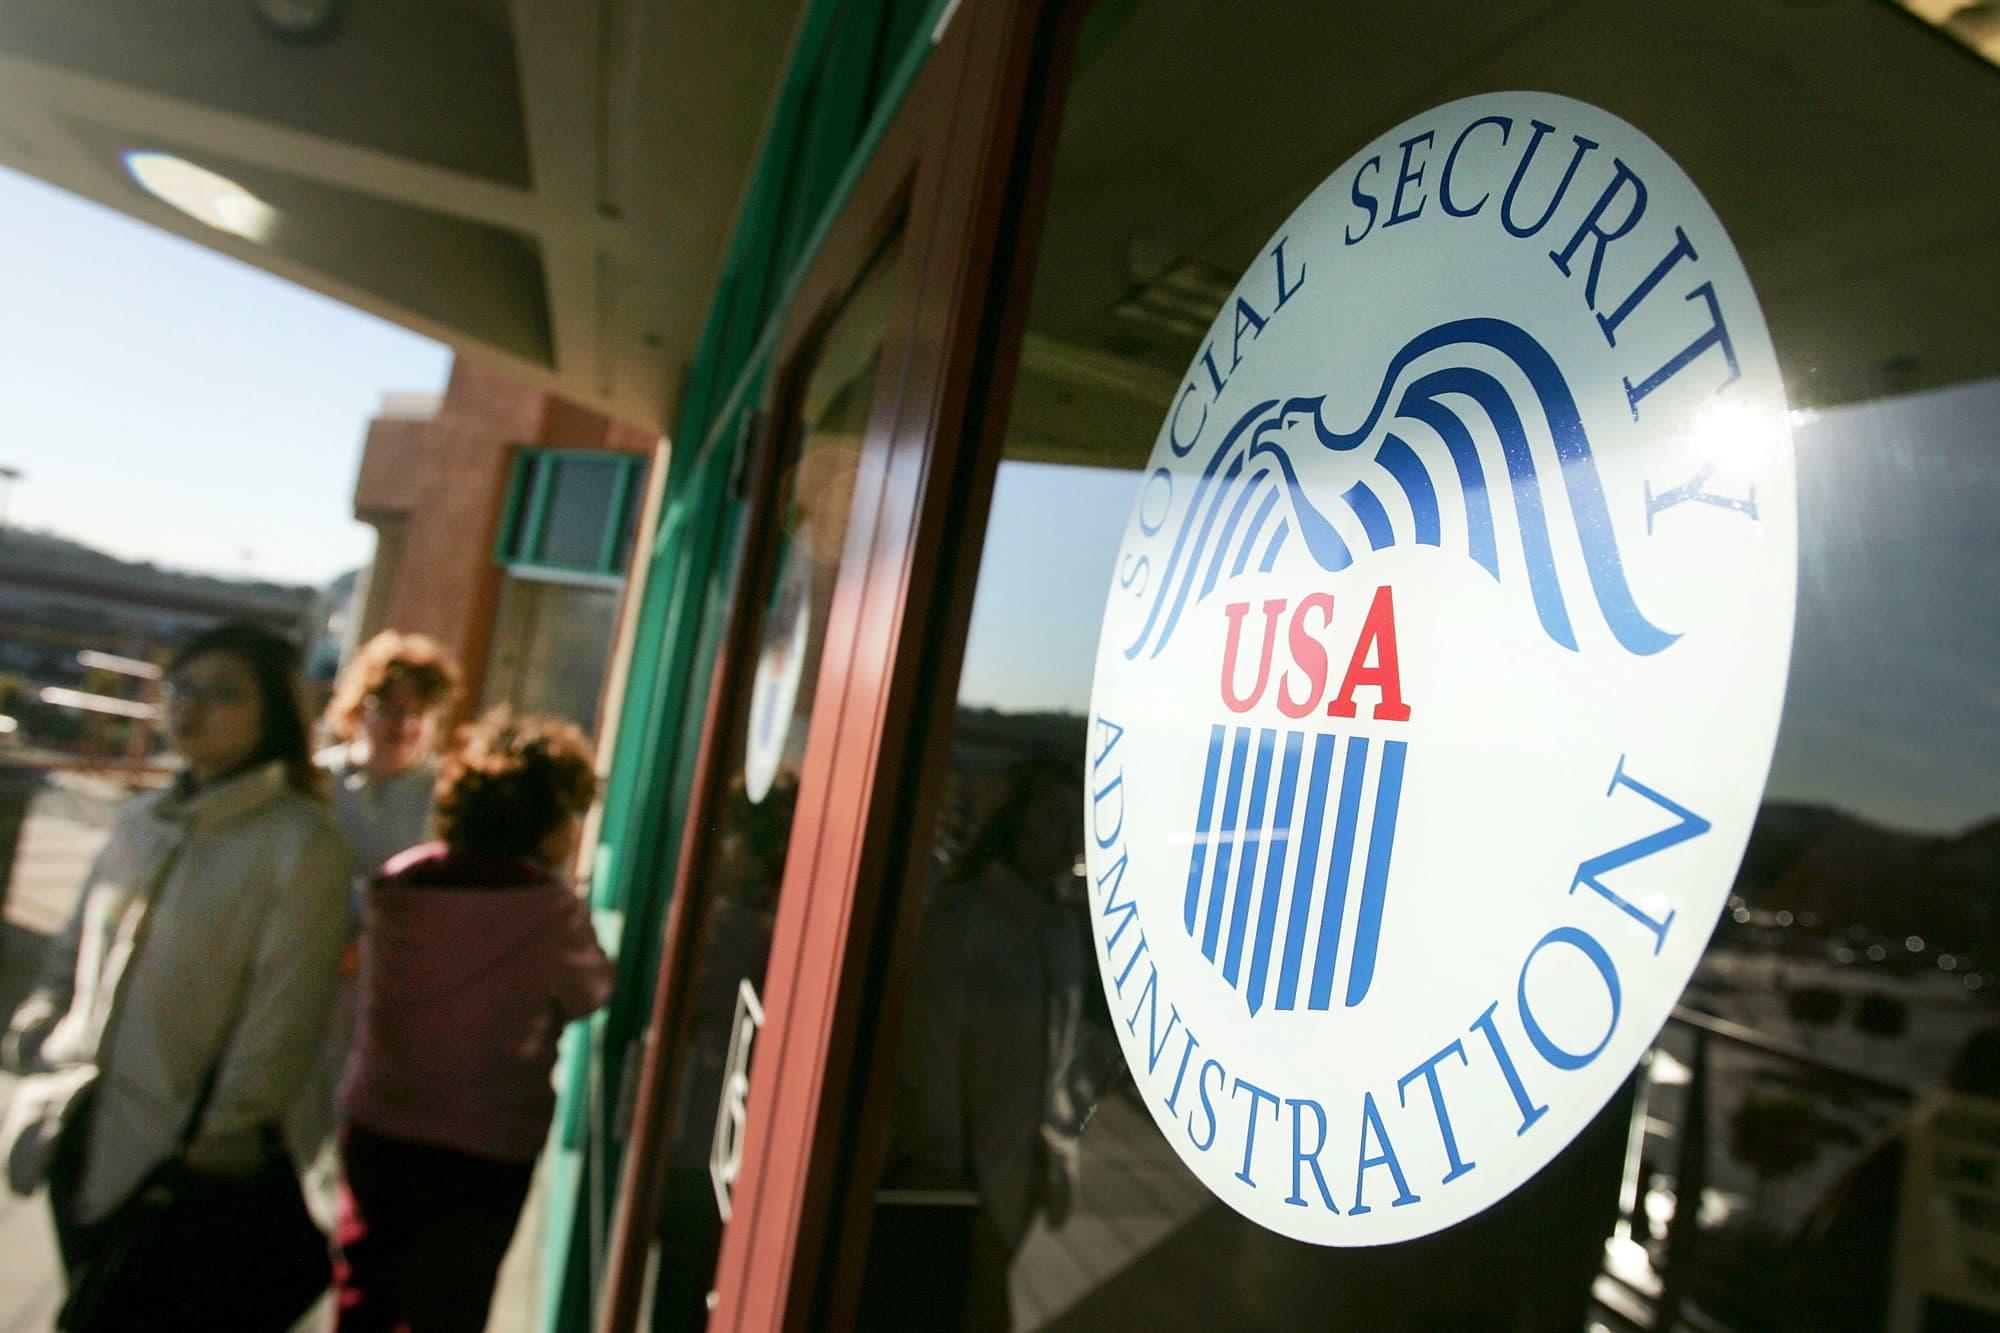 Social Security has a looming trillion shortfall